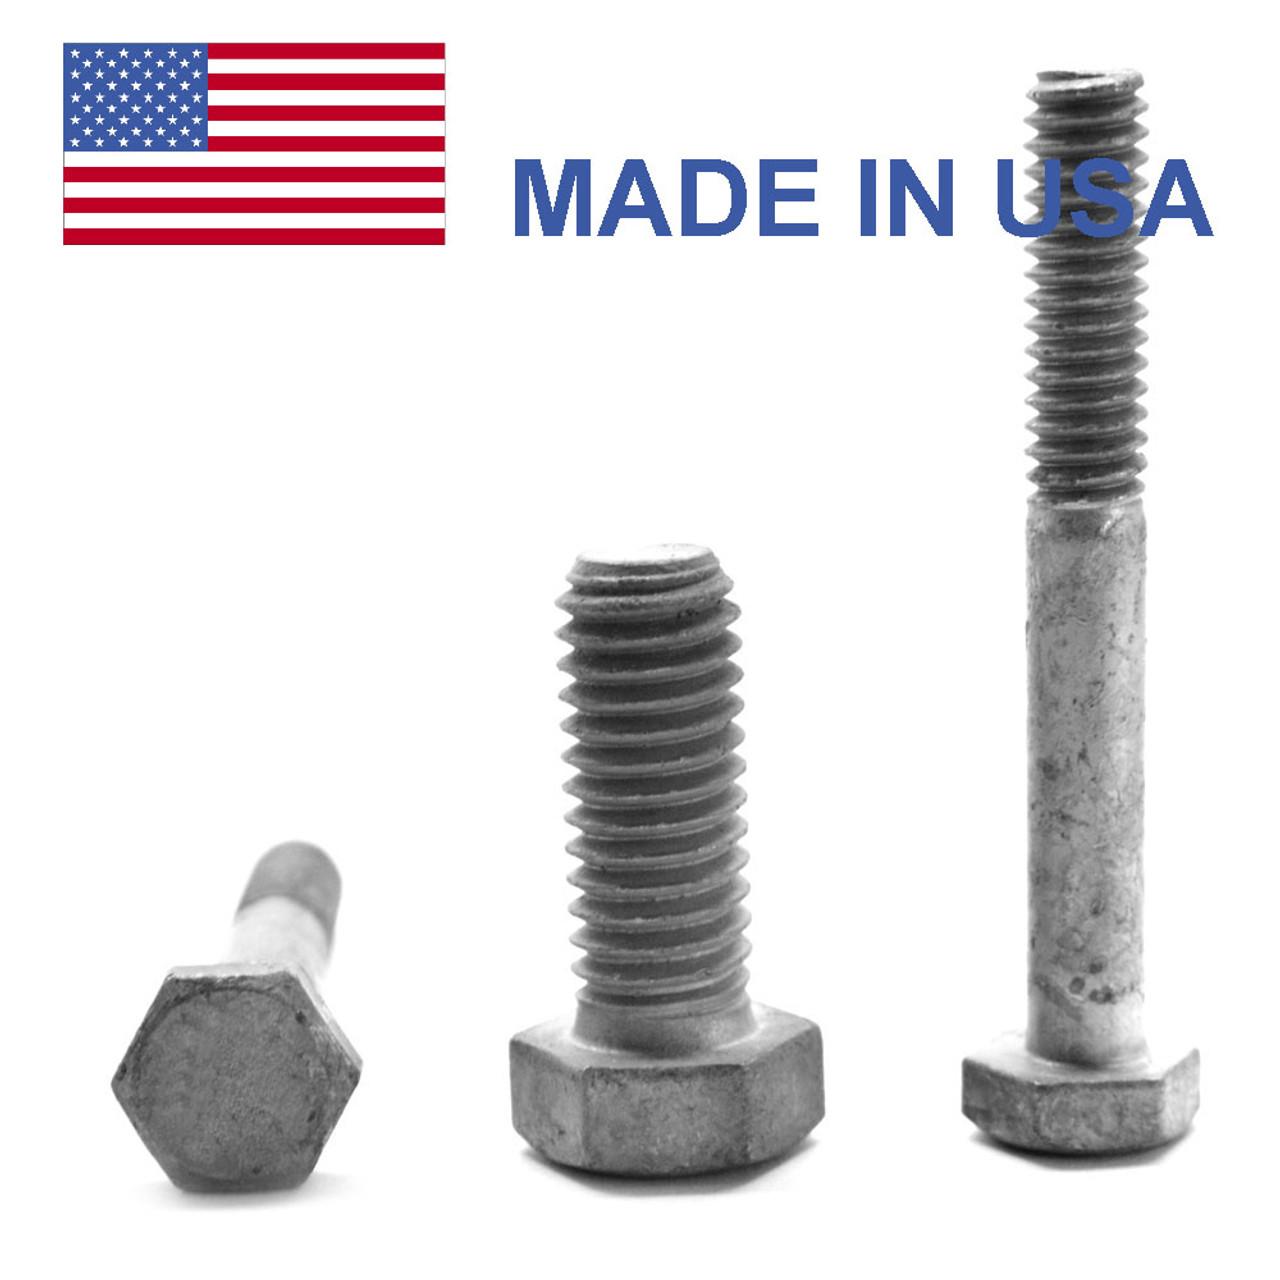 "1/2""-13 x 2 1/2"" Coarse Thread Grade A325 Type 1 Heavy Hex Structural Bolt - USA Medium Carbon Steel Hot Dip Galvanized"